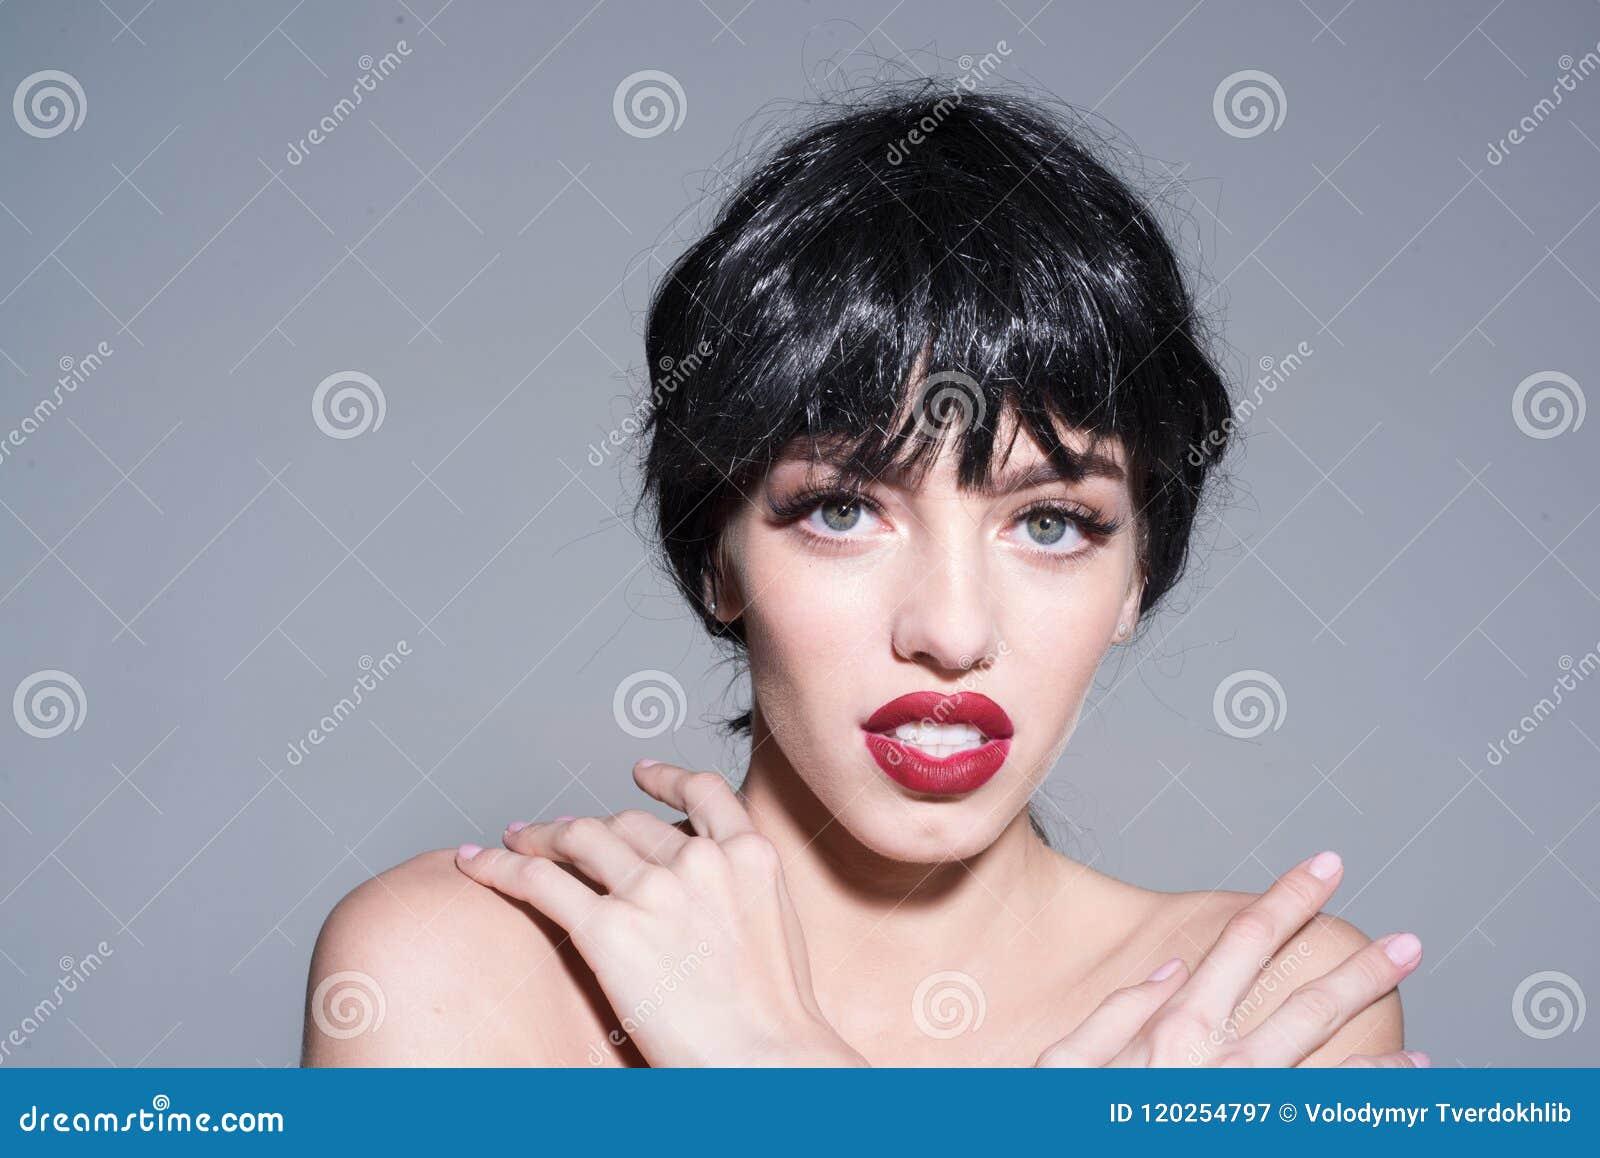 Beautiful Woman With Stylish Make Up Big Green Eyes Short Glossy